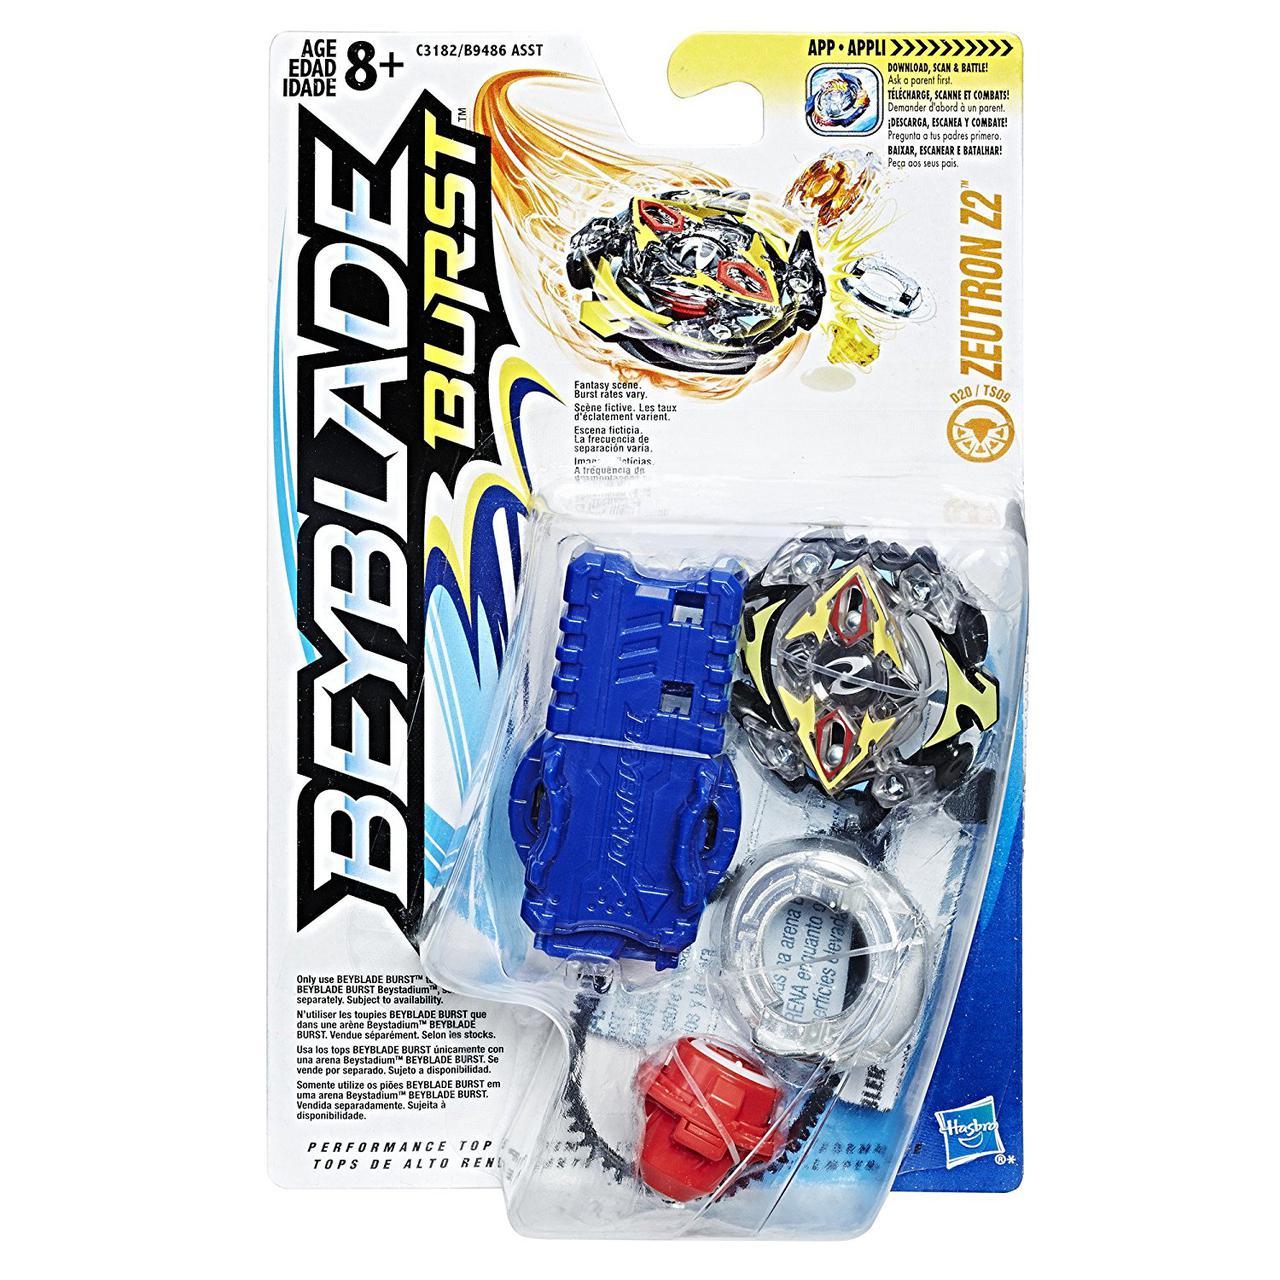 Бейблейд Зейтрон Z2 с пусковым устройством Hasbro (Beyblade Burst Zeutron Z2)